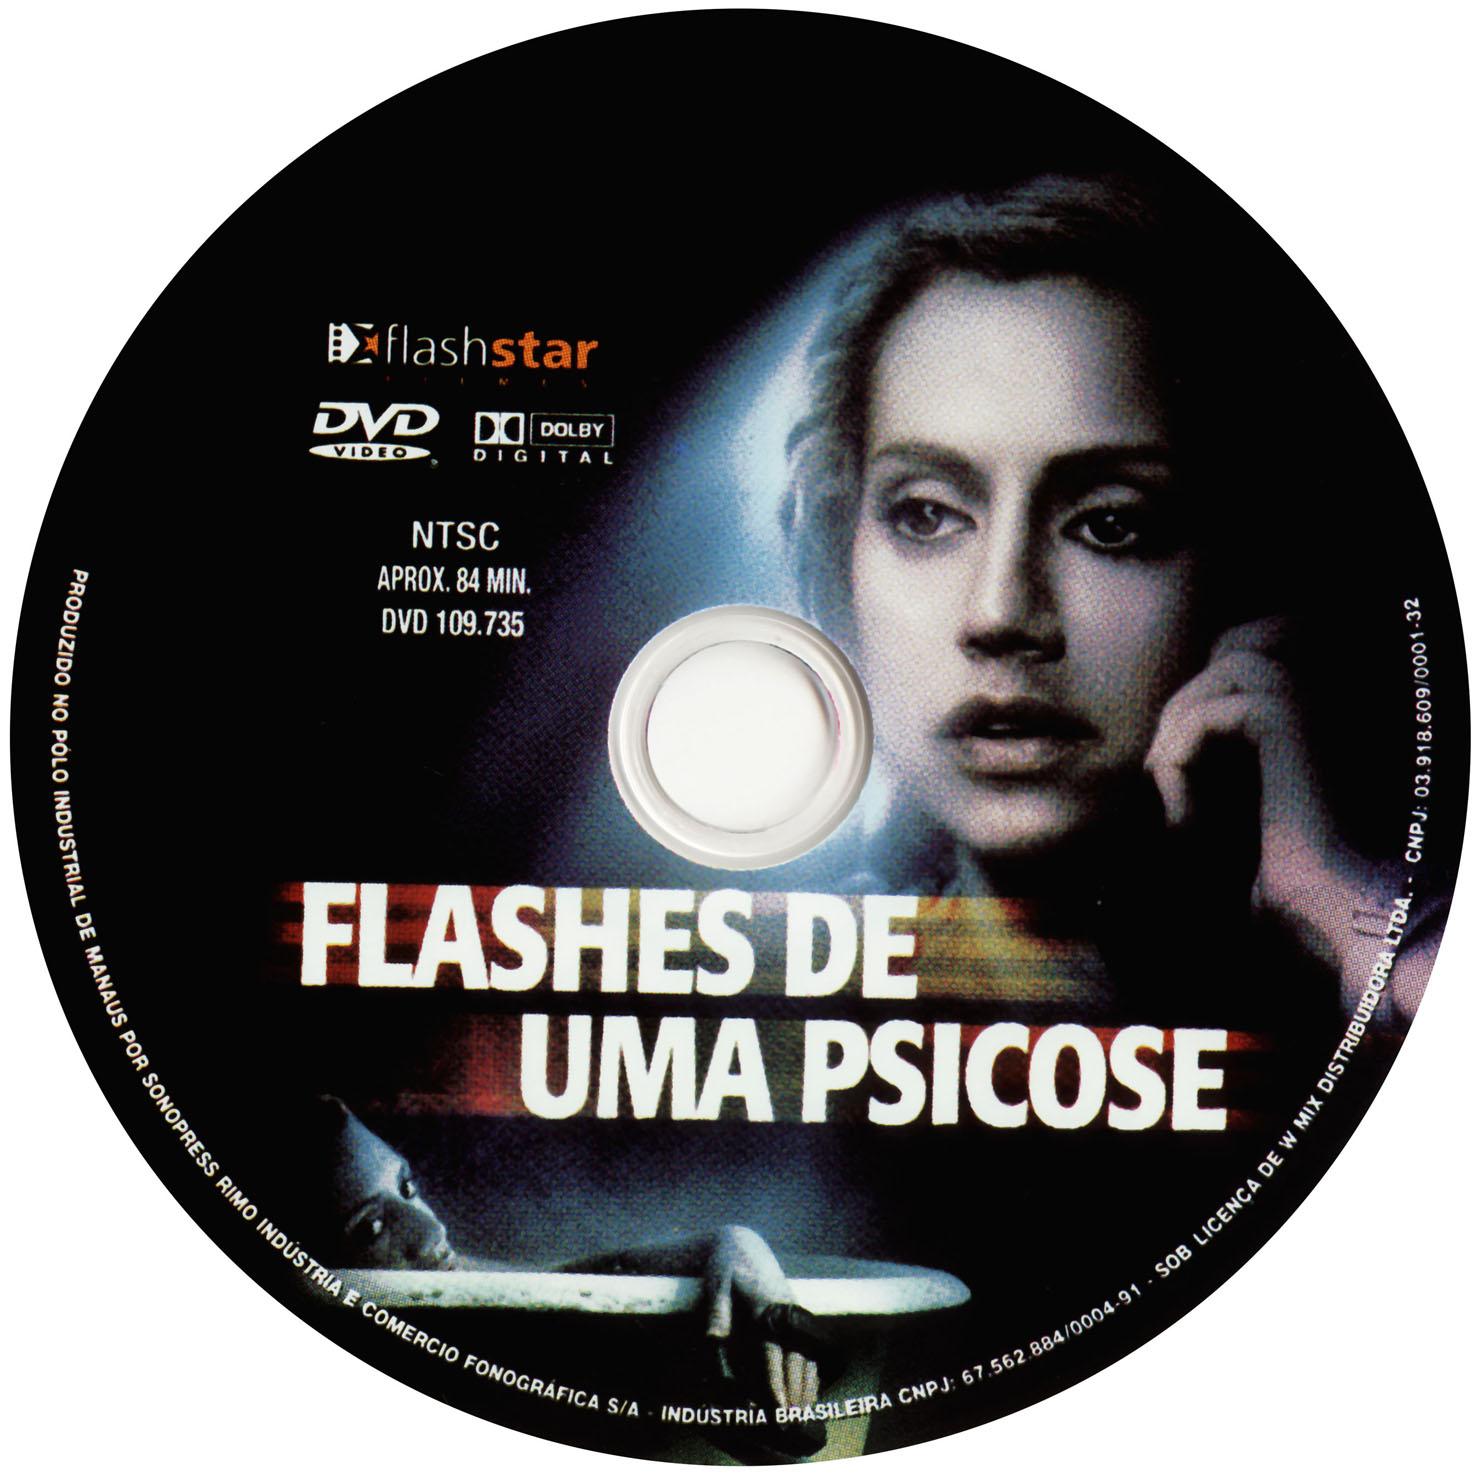 http://3.bp.blogspot.com/_MooL5ry7AfU/TMJpJFkJkMI/AAAAAAAABzQ/6CQwHXmQ3k8/s1600/Flashes%2BDe%2BUma%2BPsicose%2Blabel.jpg